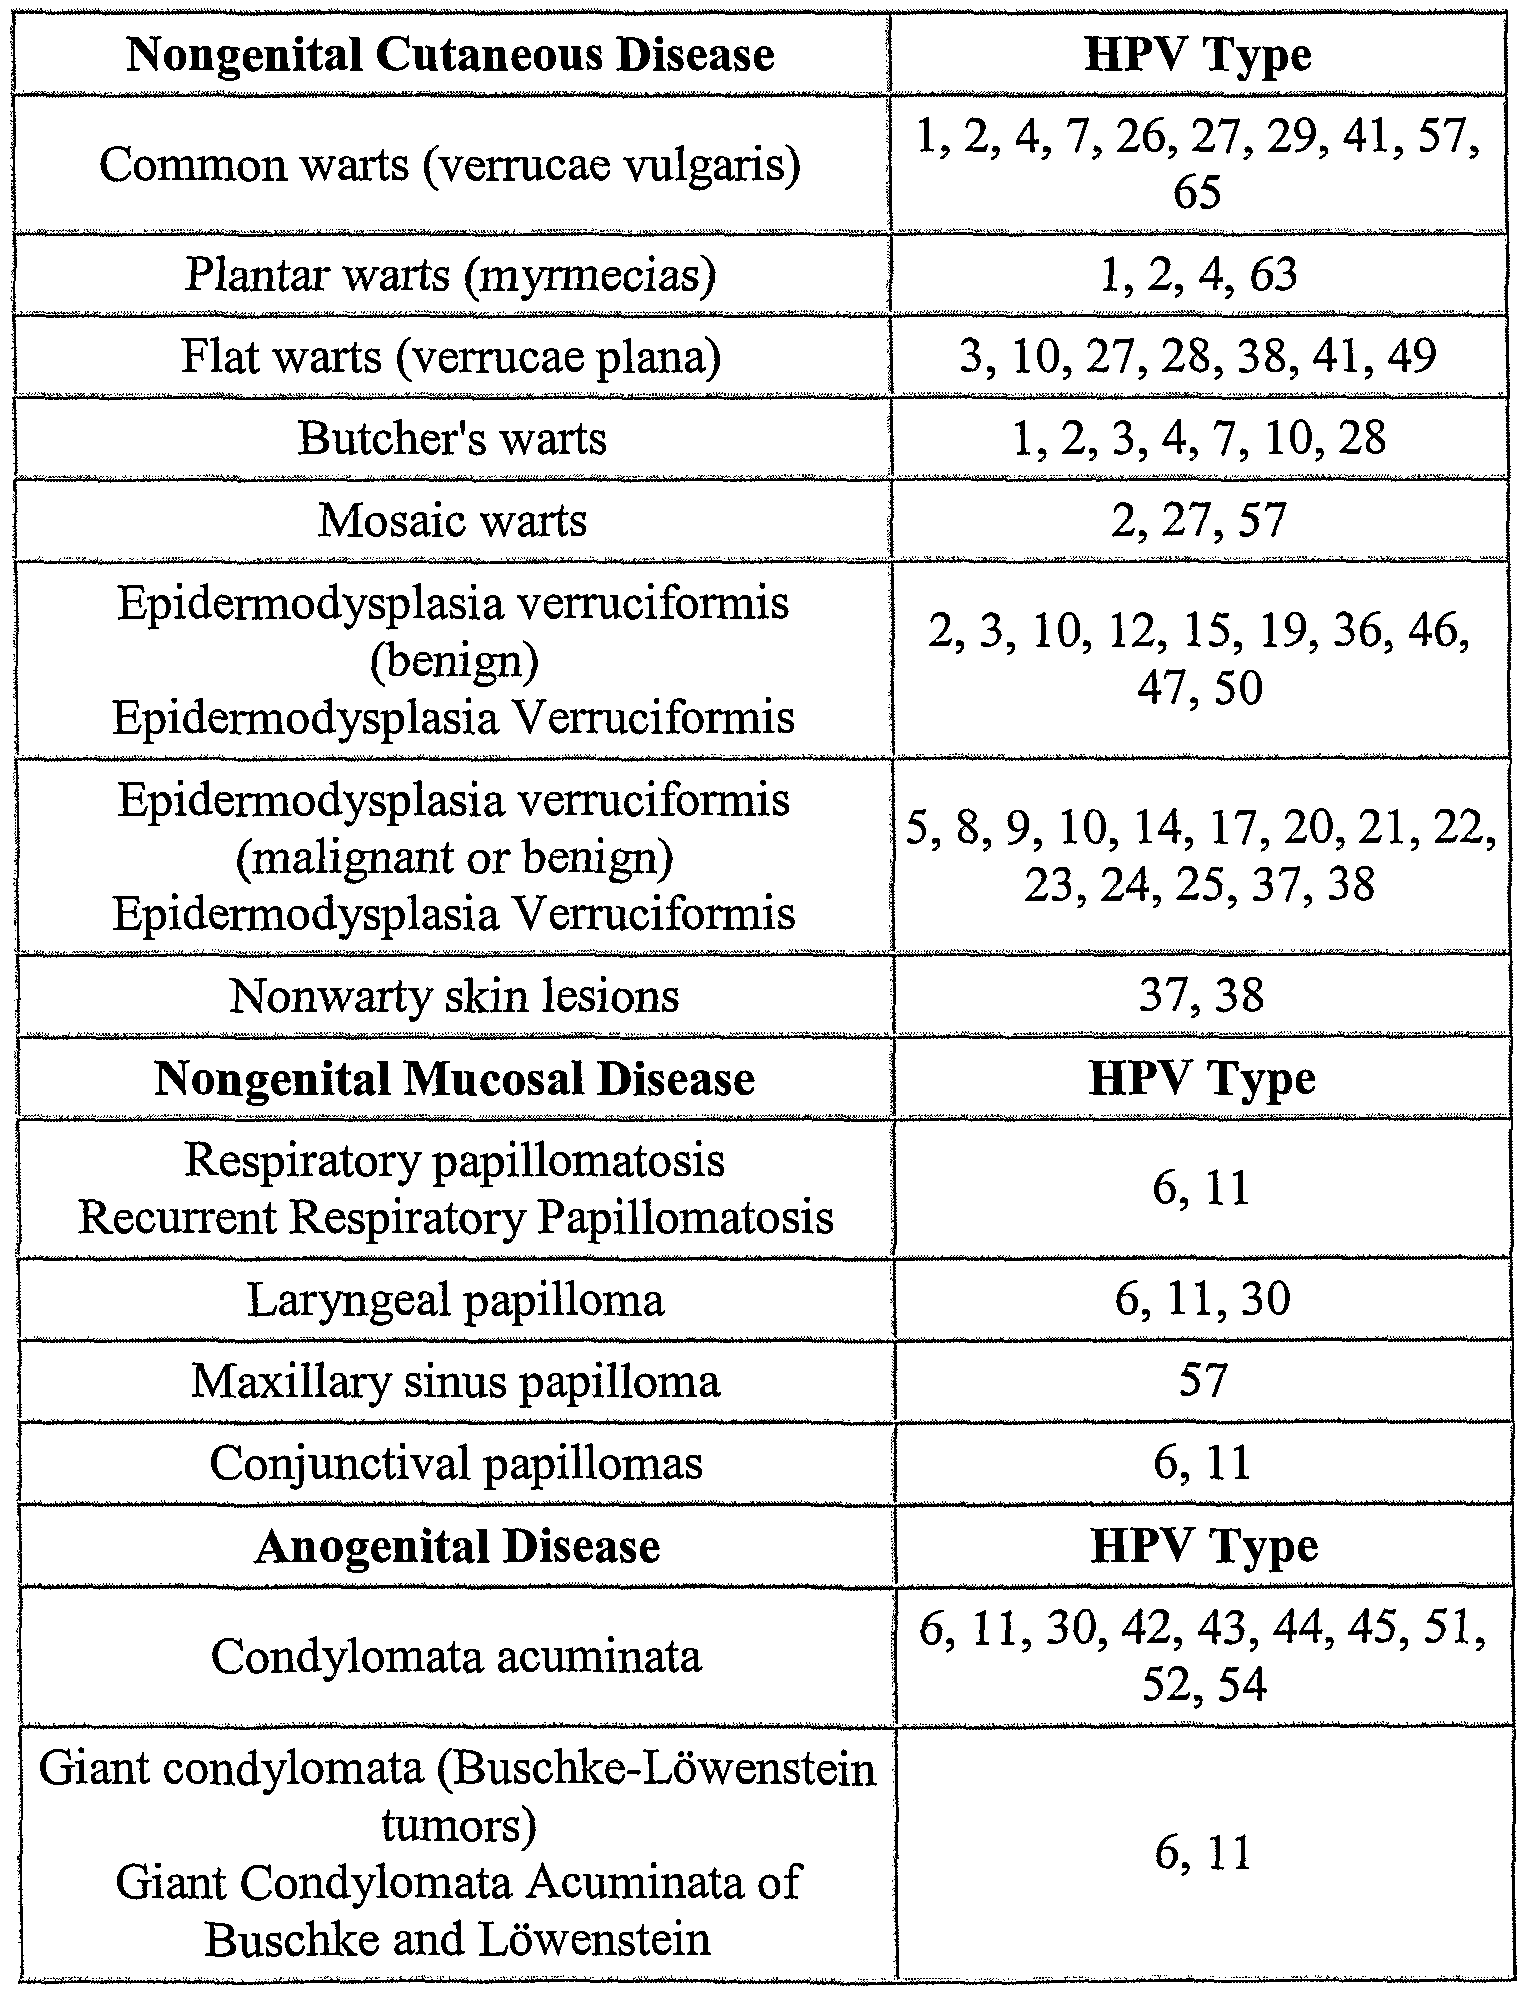 Verrucae; Myrmecia Verrucae; Plantar warts Information ...